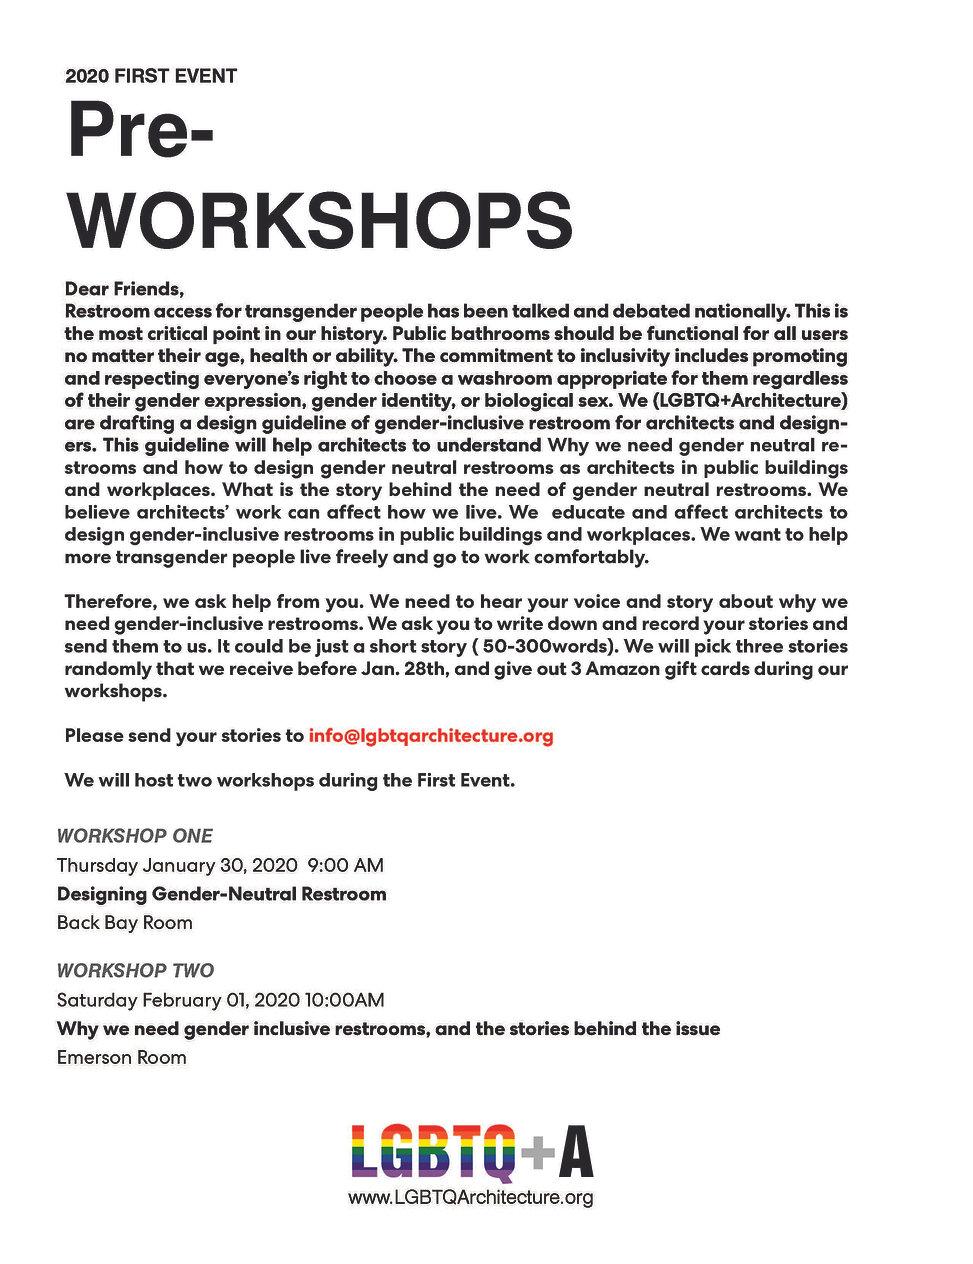 Pre-workshops-FromLGBTQArchitecture.jpg